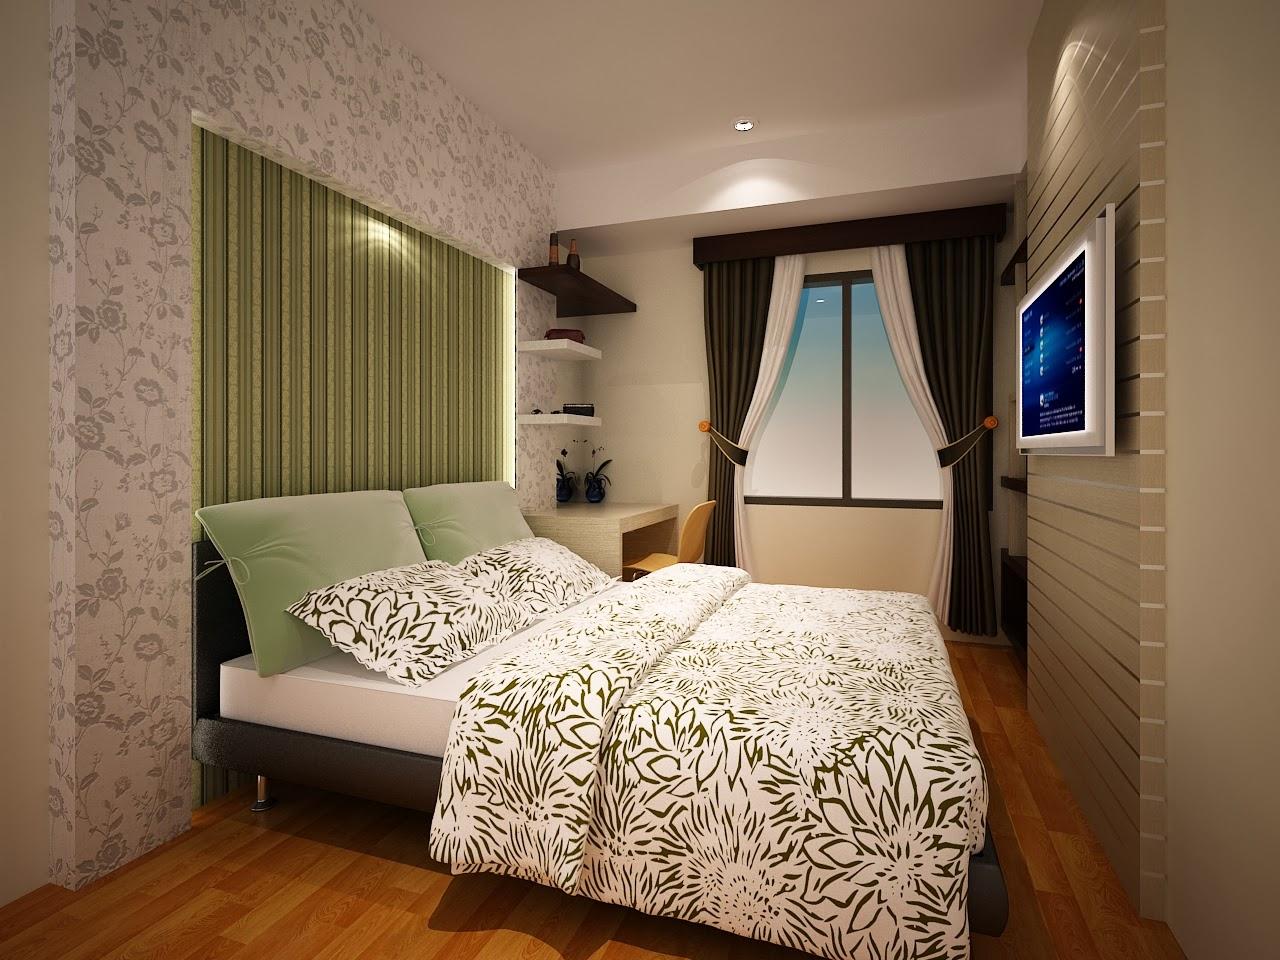 Desain interior apartemen silkwood residence 1 bedroom for Design interior apartemen 1 bedroom